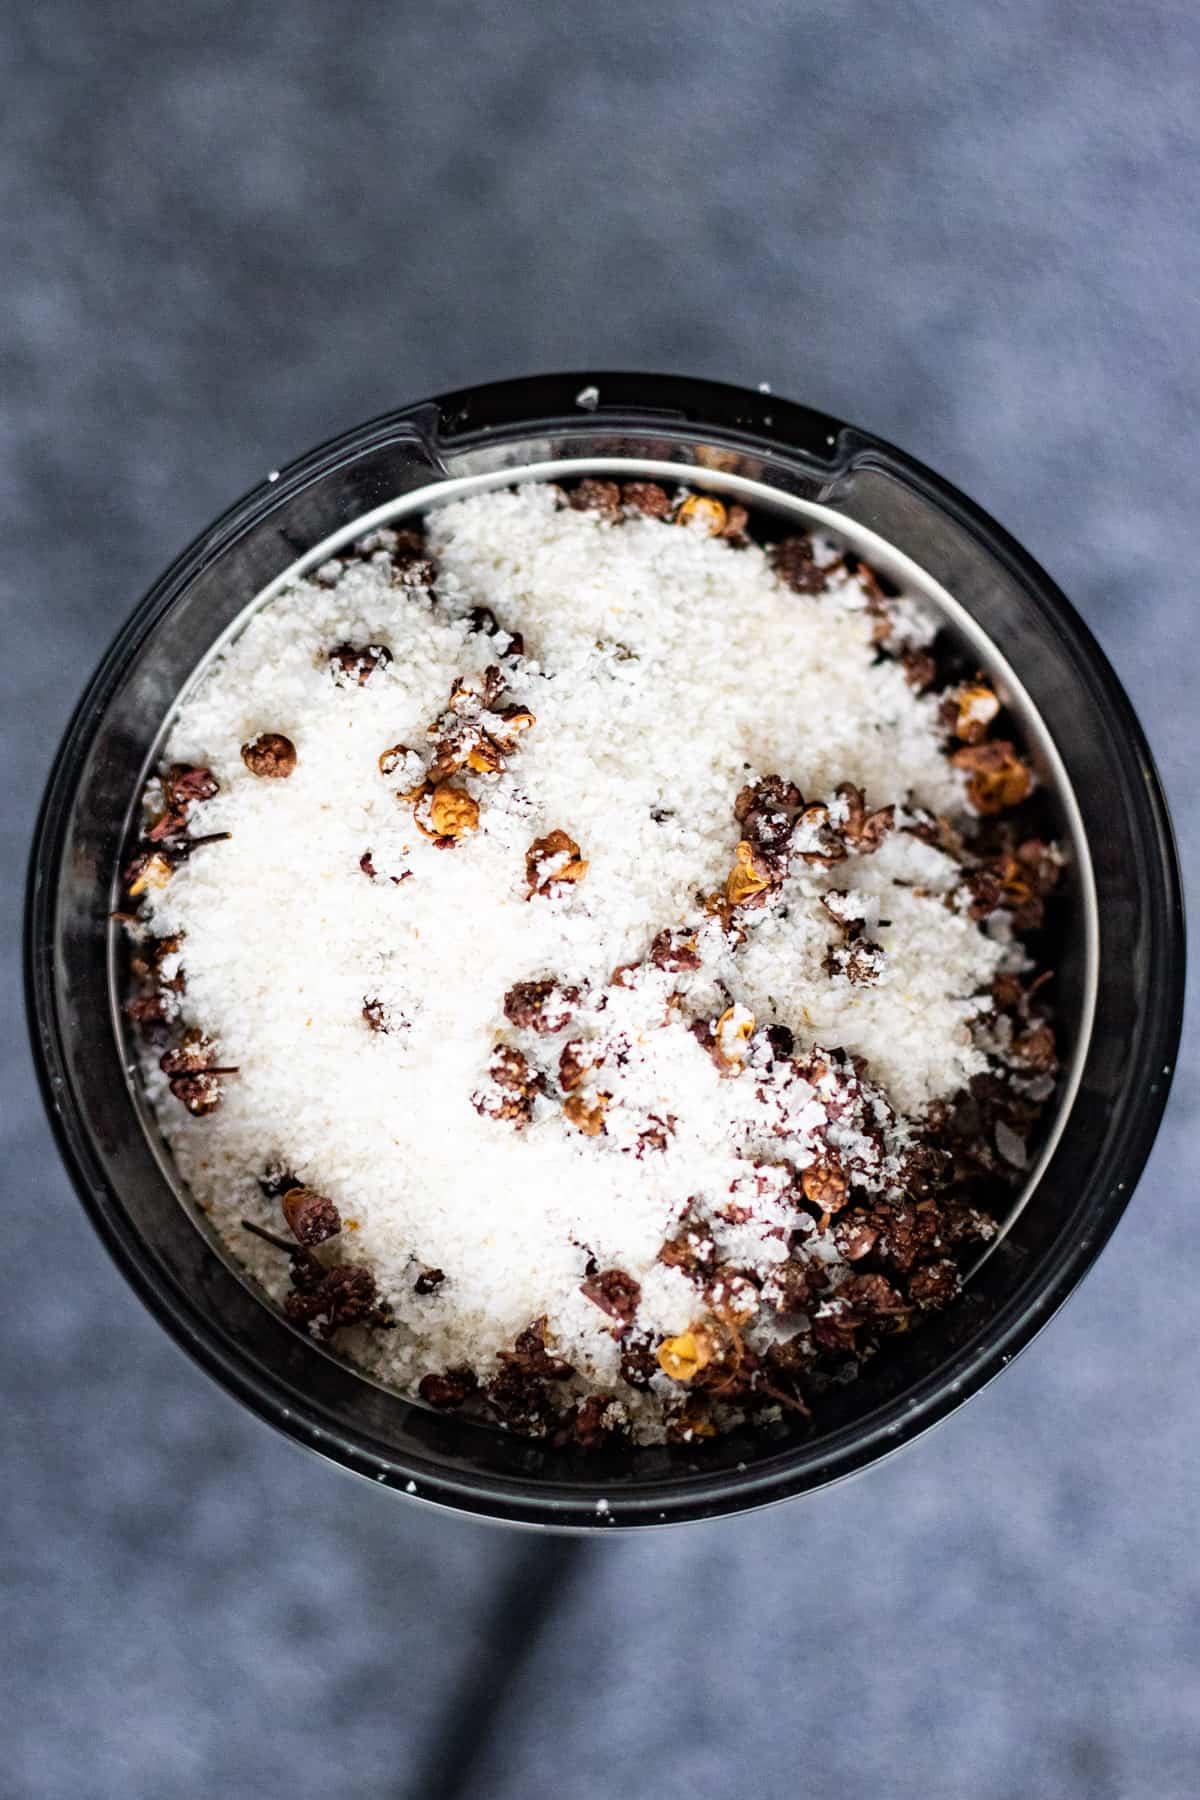 Overhead shot of Szechuan peppercorns and kosher salt in a spice grinder.